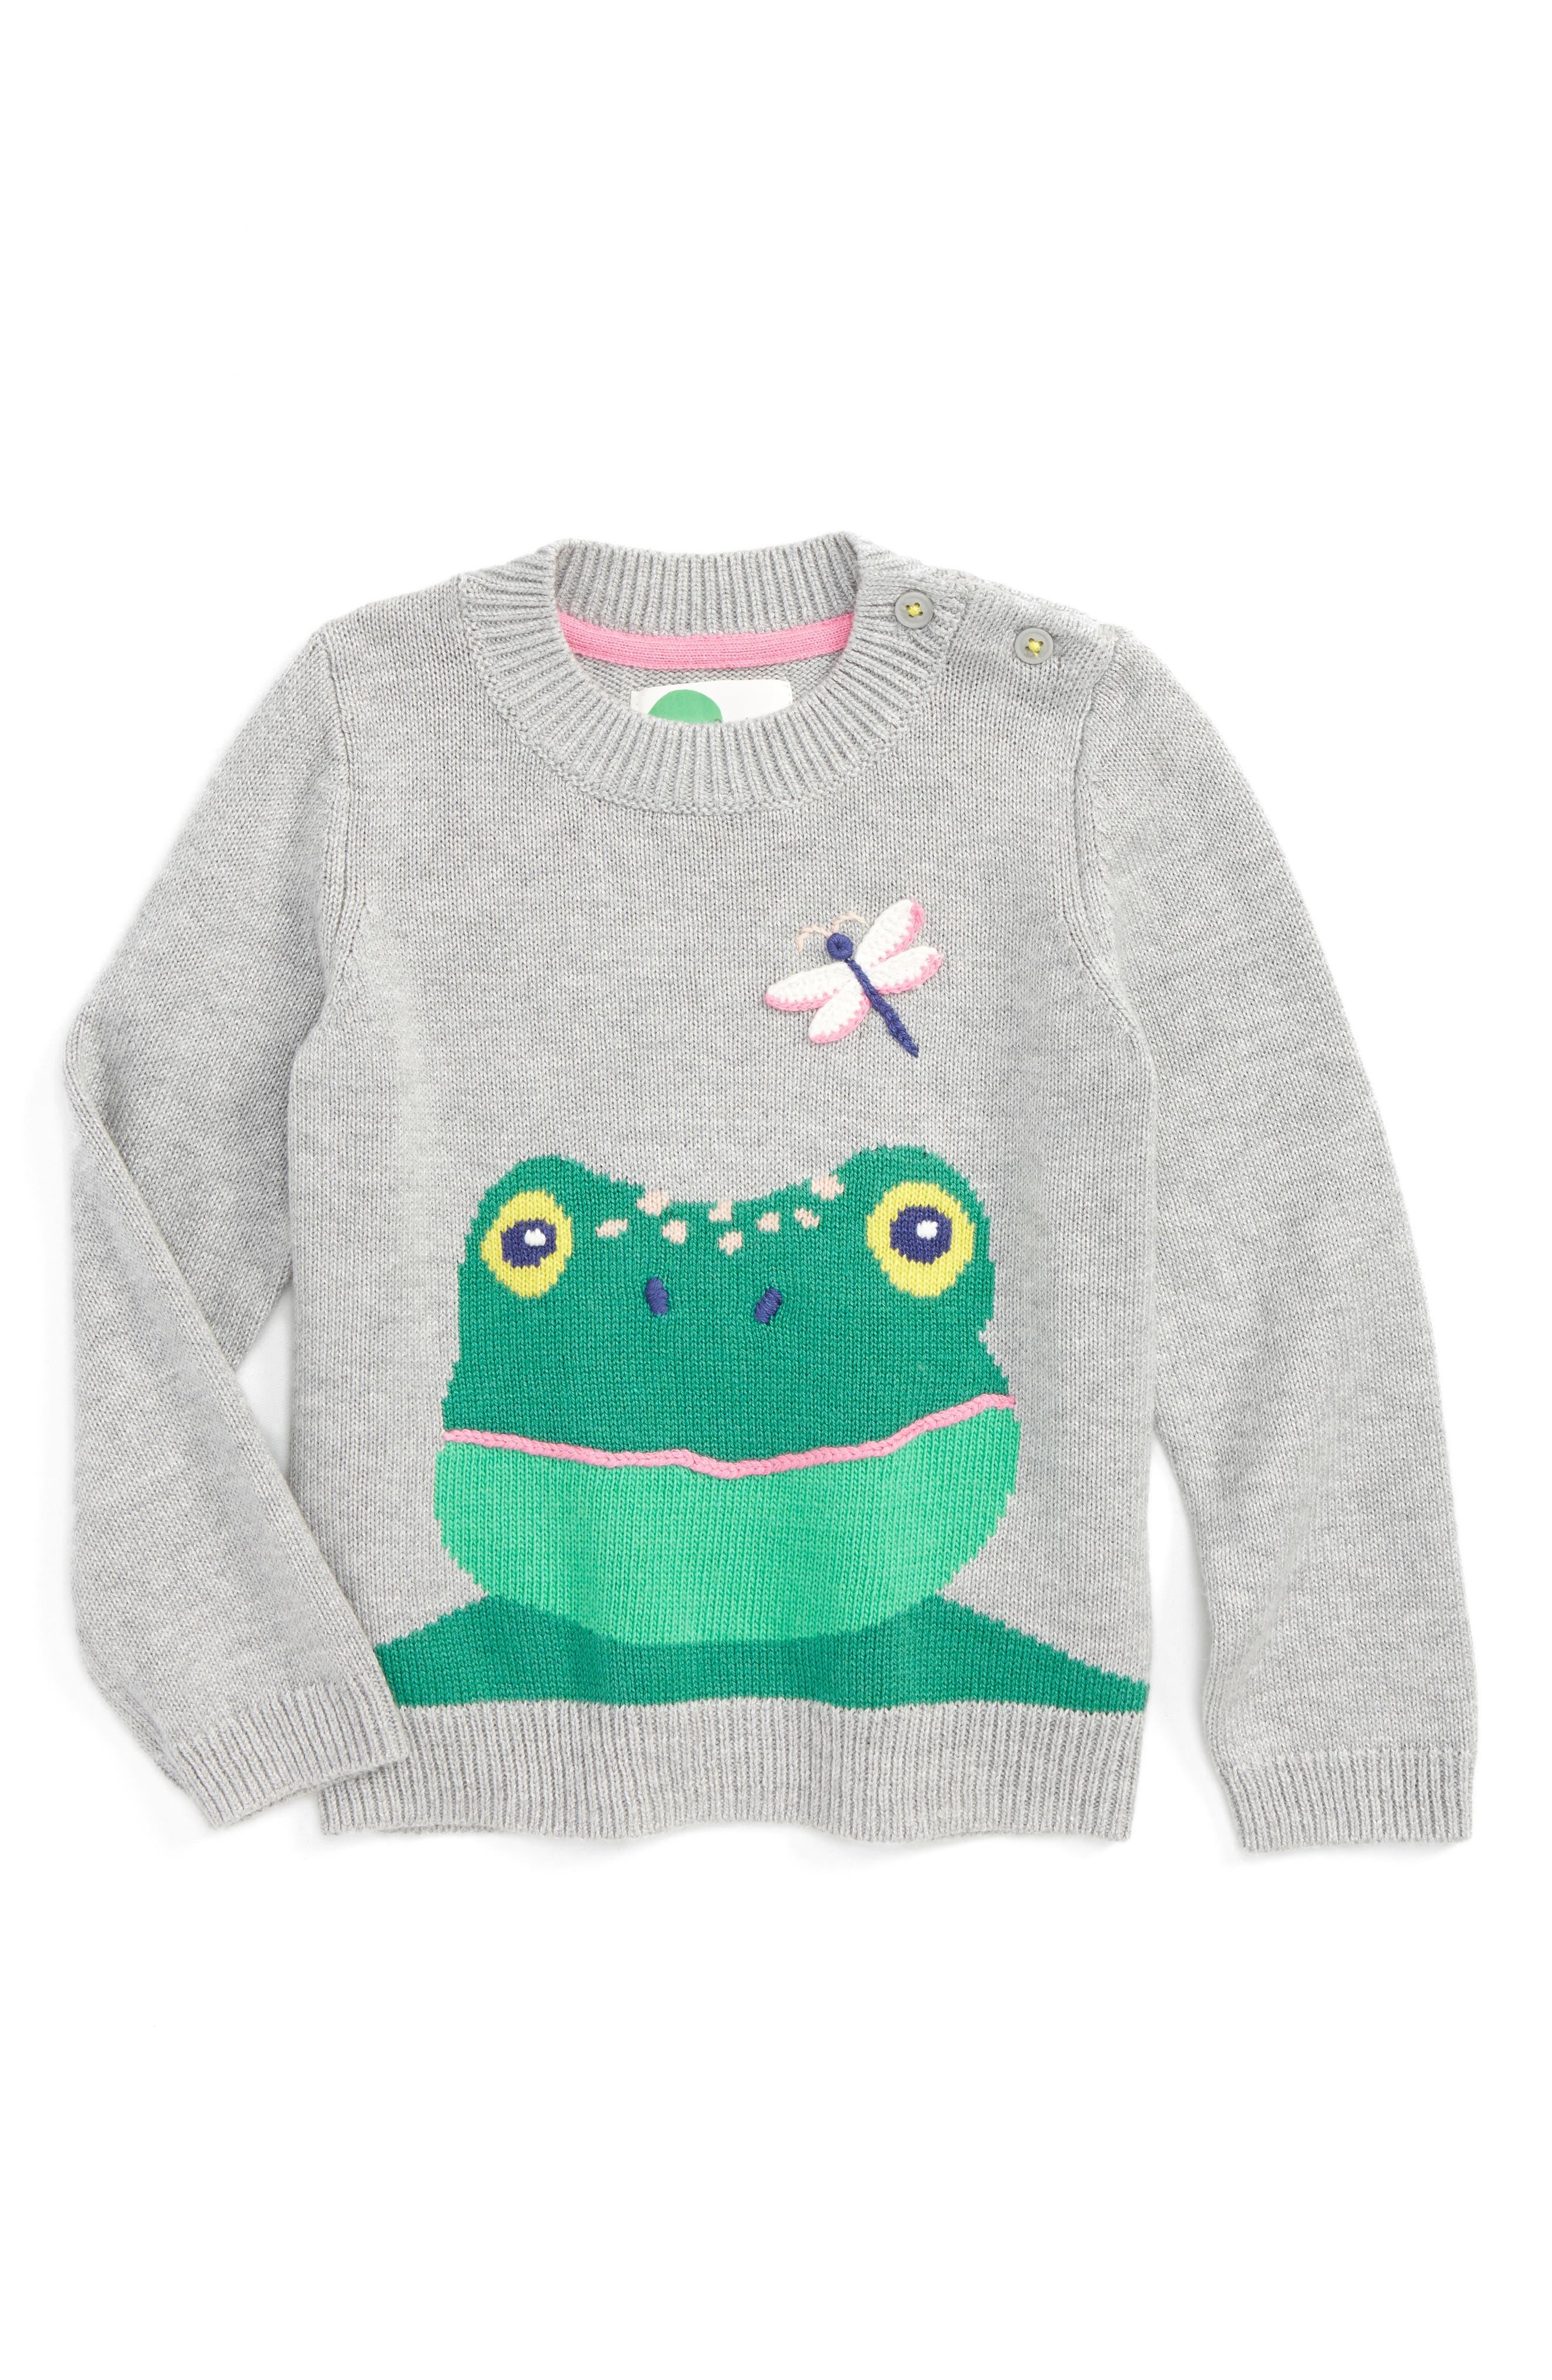 Mini Boden Fun Embroidered Sweater (Toddler Girls, Little Girls & Big Girls)